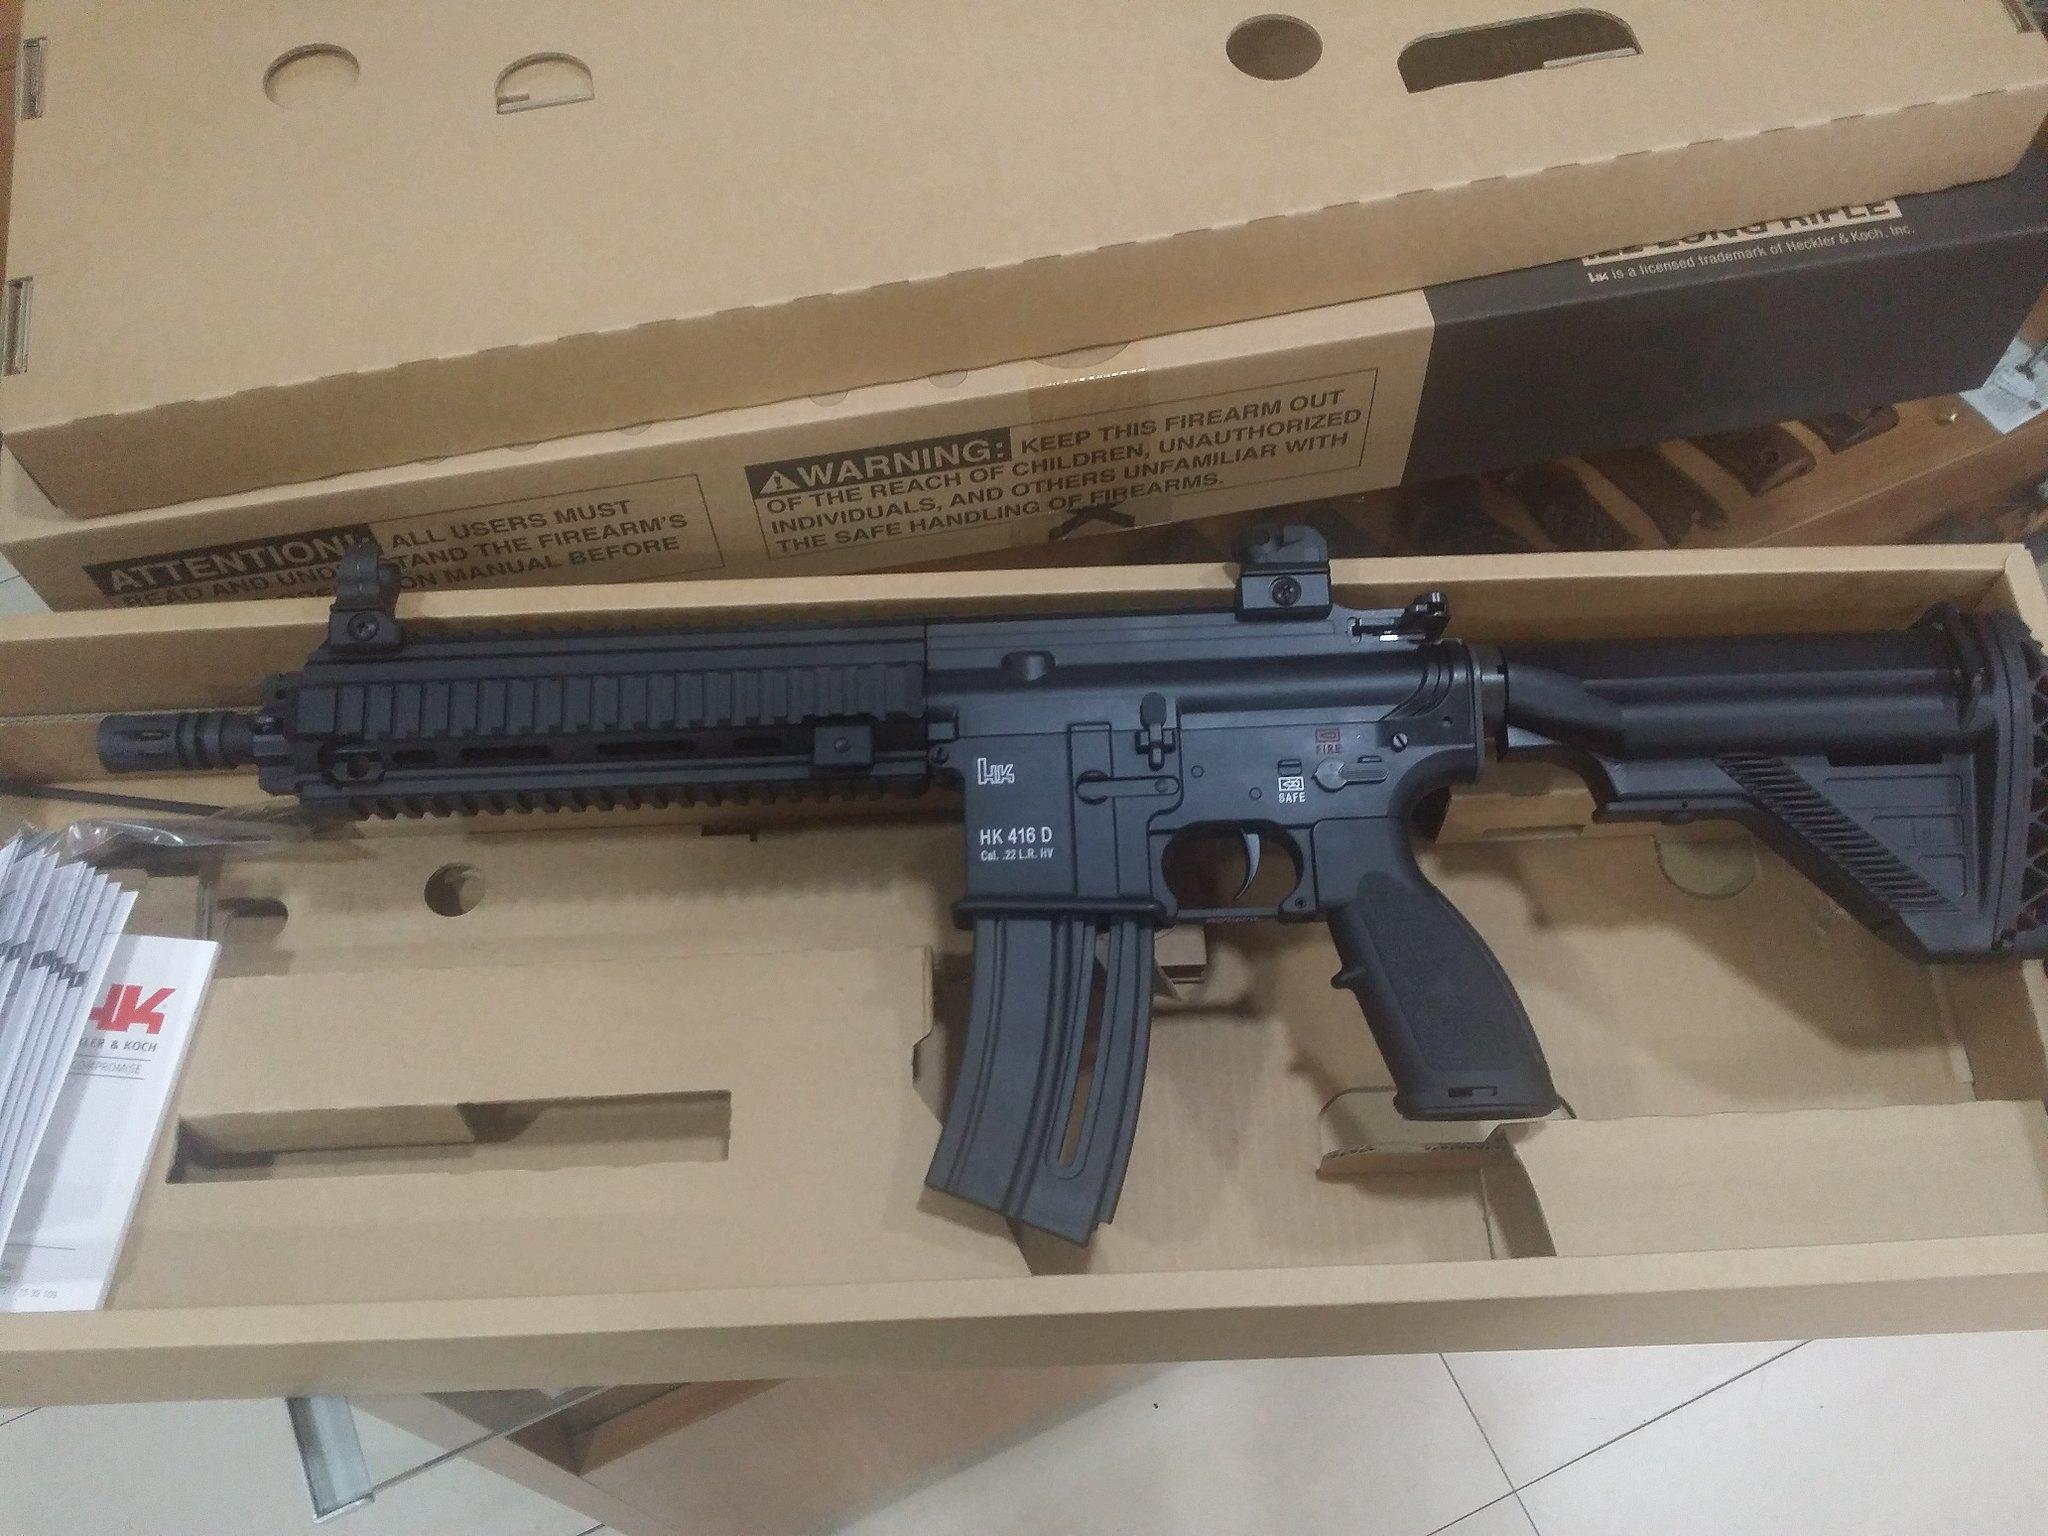 HK 416 22lr (710€) ###VENDIDA### - Armas es foro de tiro, caza